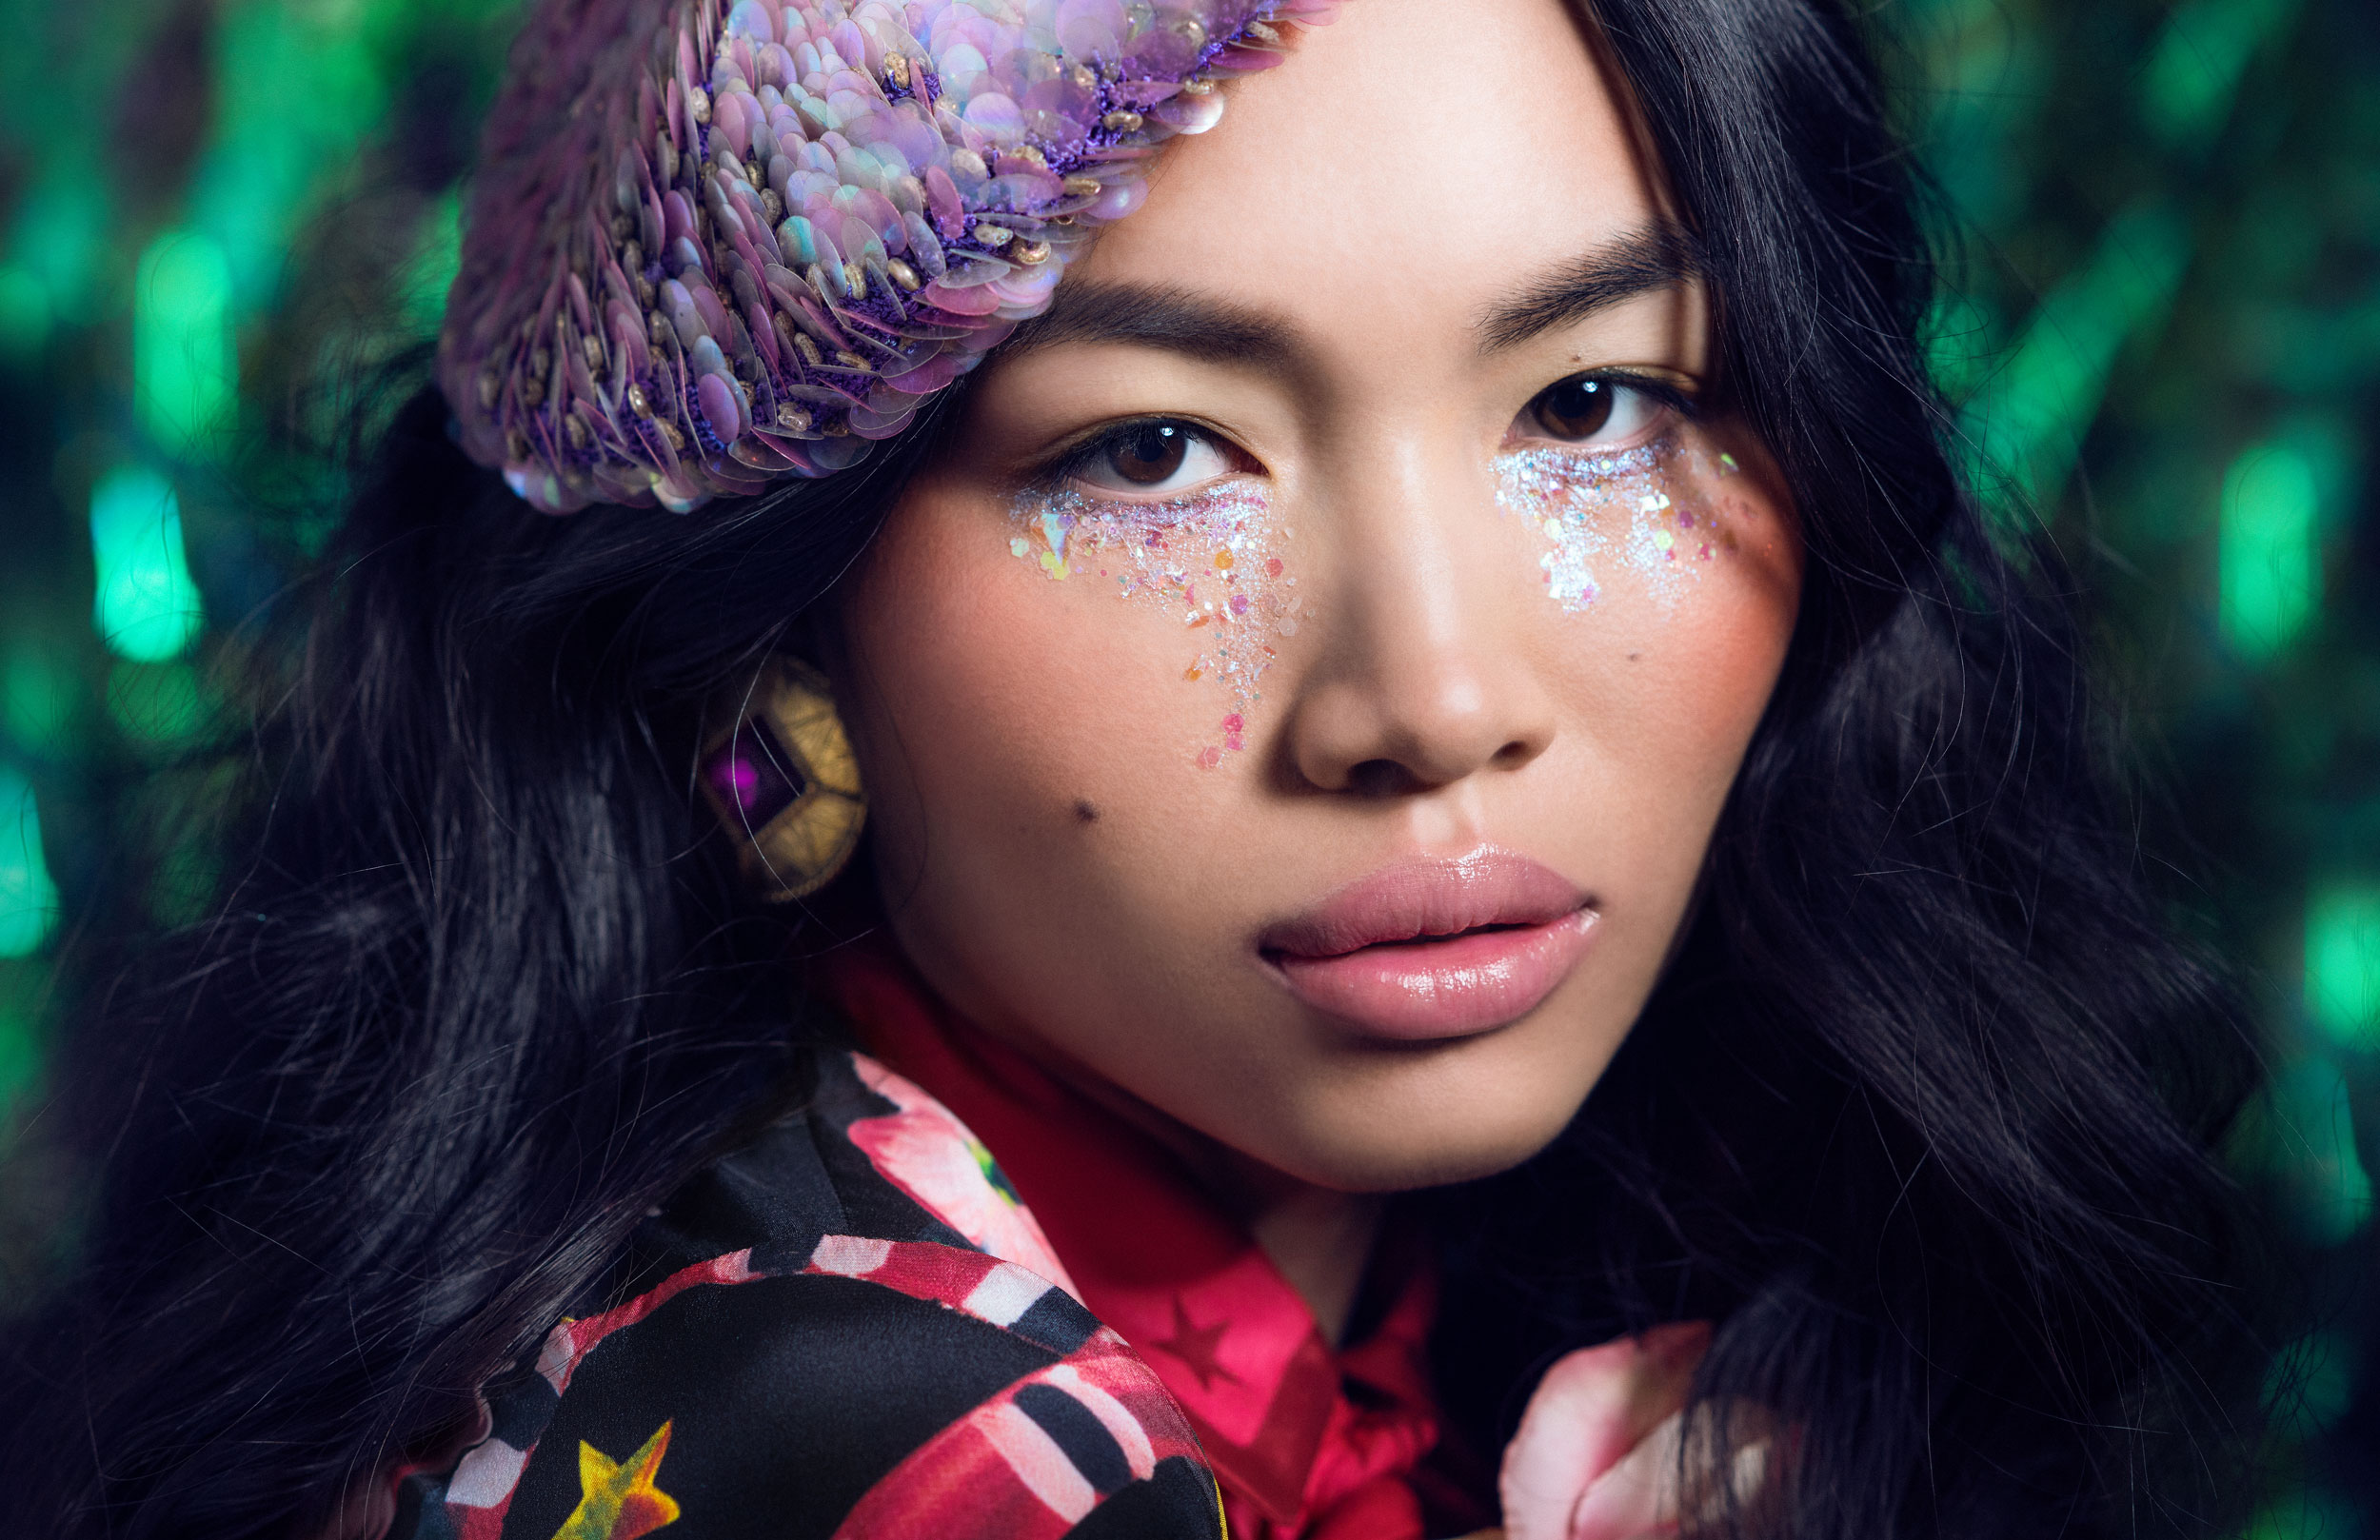 Augusta_Sagnelli_Glitter_Beauty_Editorial-3.jpg